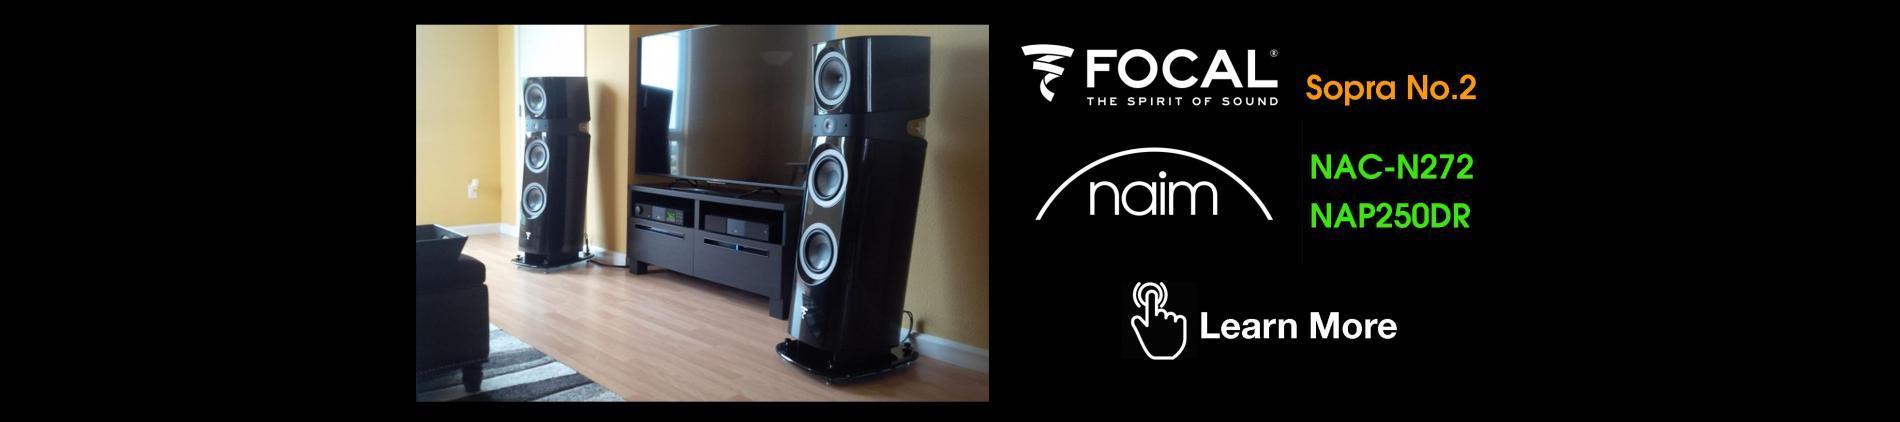 Naim Audio NAC-N272, NAP250DR, Focal, Sopra No2, Sopra, Naim Classic Series, High End Audio Victoria,BC, Stereos Victoria, BC, Tidal Music, Streaming Audio